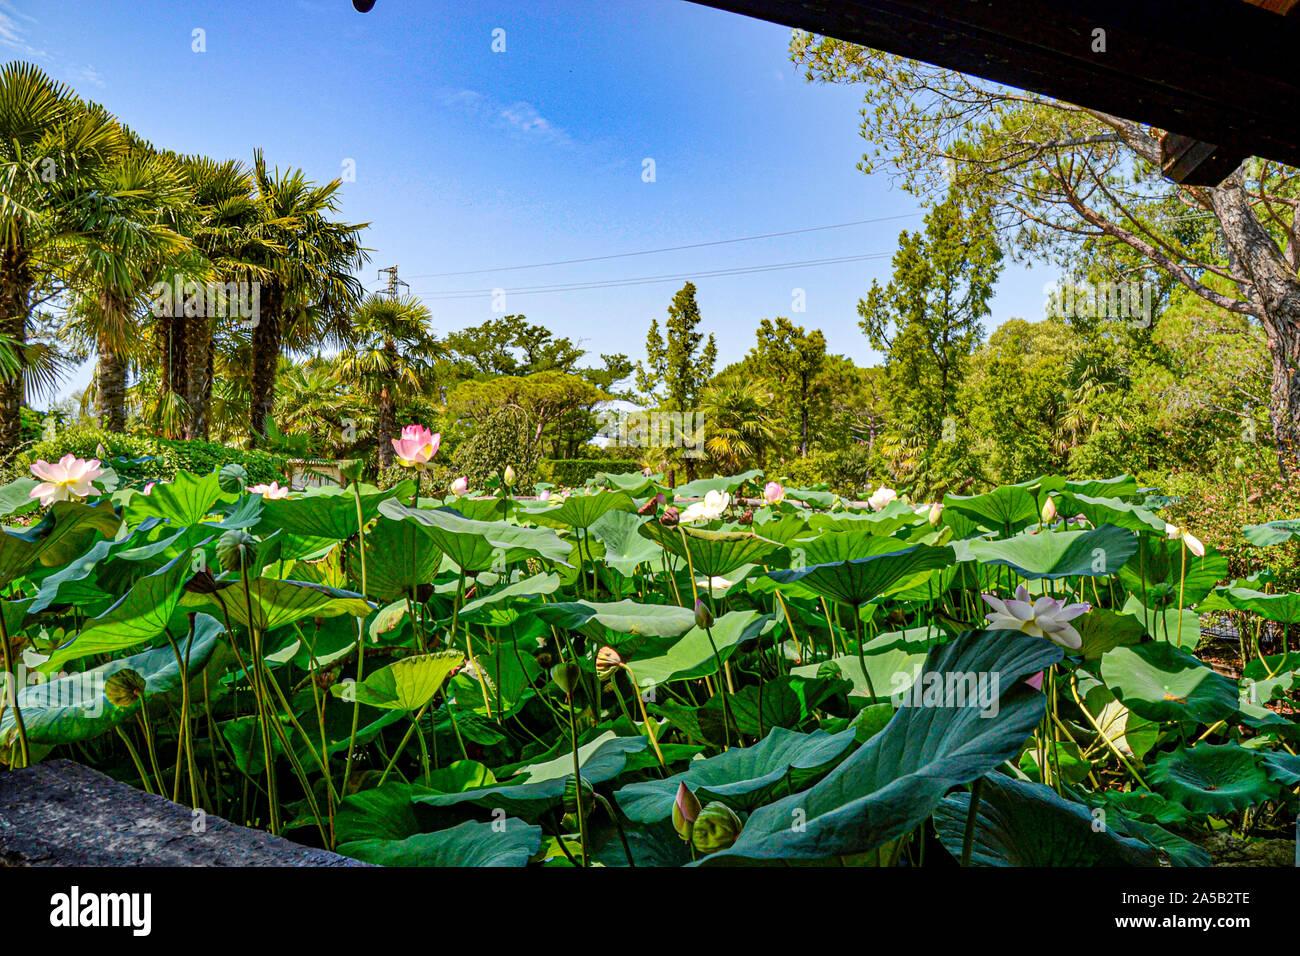 Seerosen / im Zoo Punta Verde in Lignano (Italien) / Tierpark in Lignano / Sehenswürdigkeit in Lignano (Italien) Stock Photo